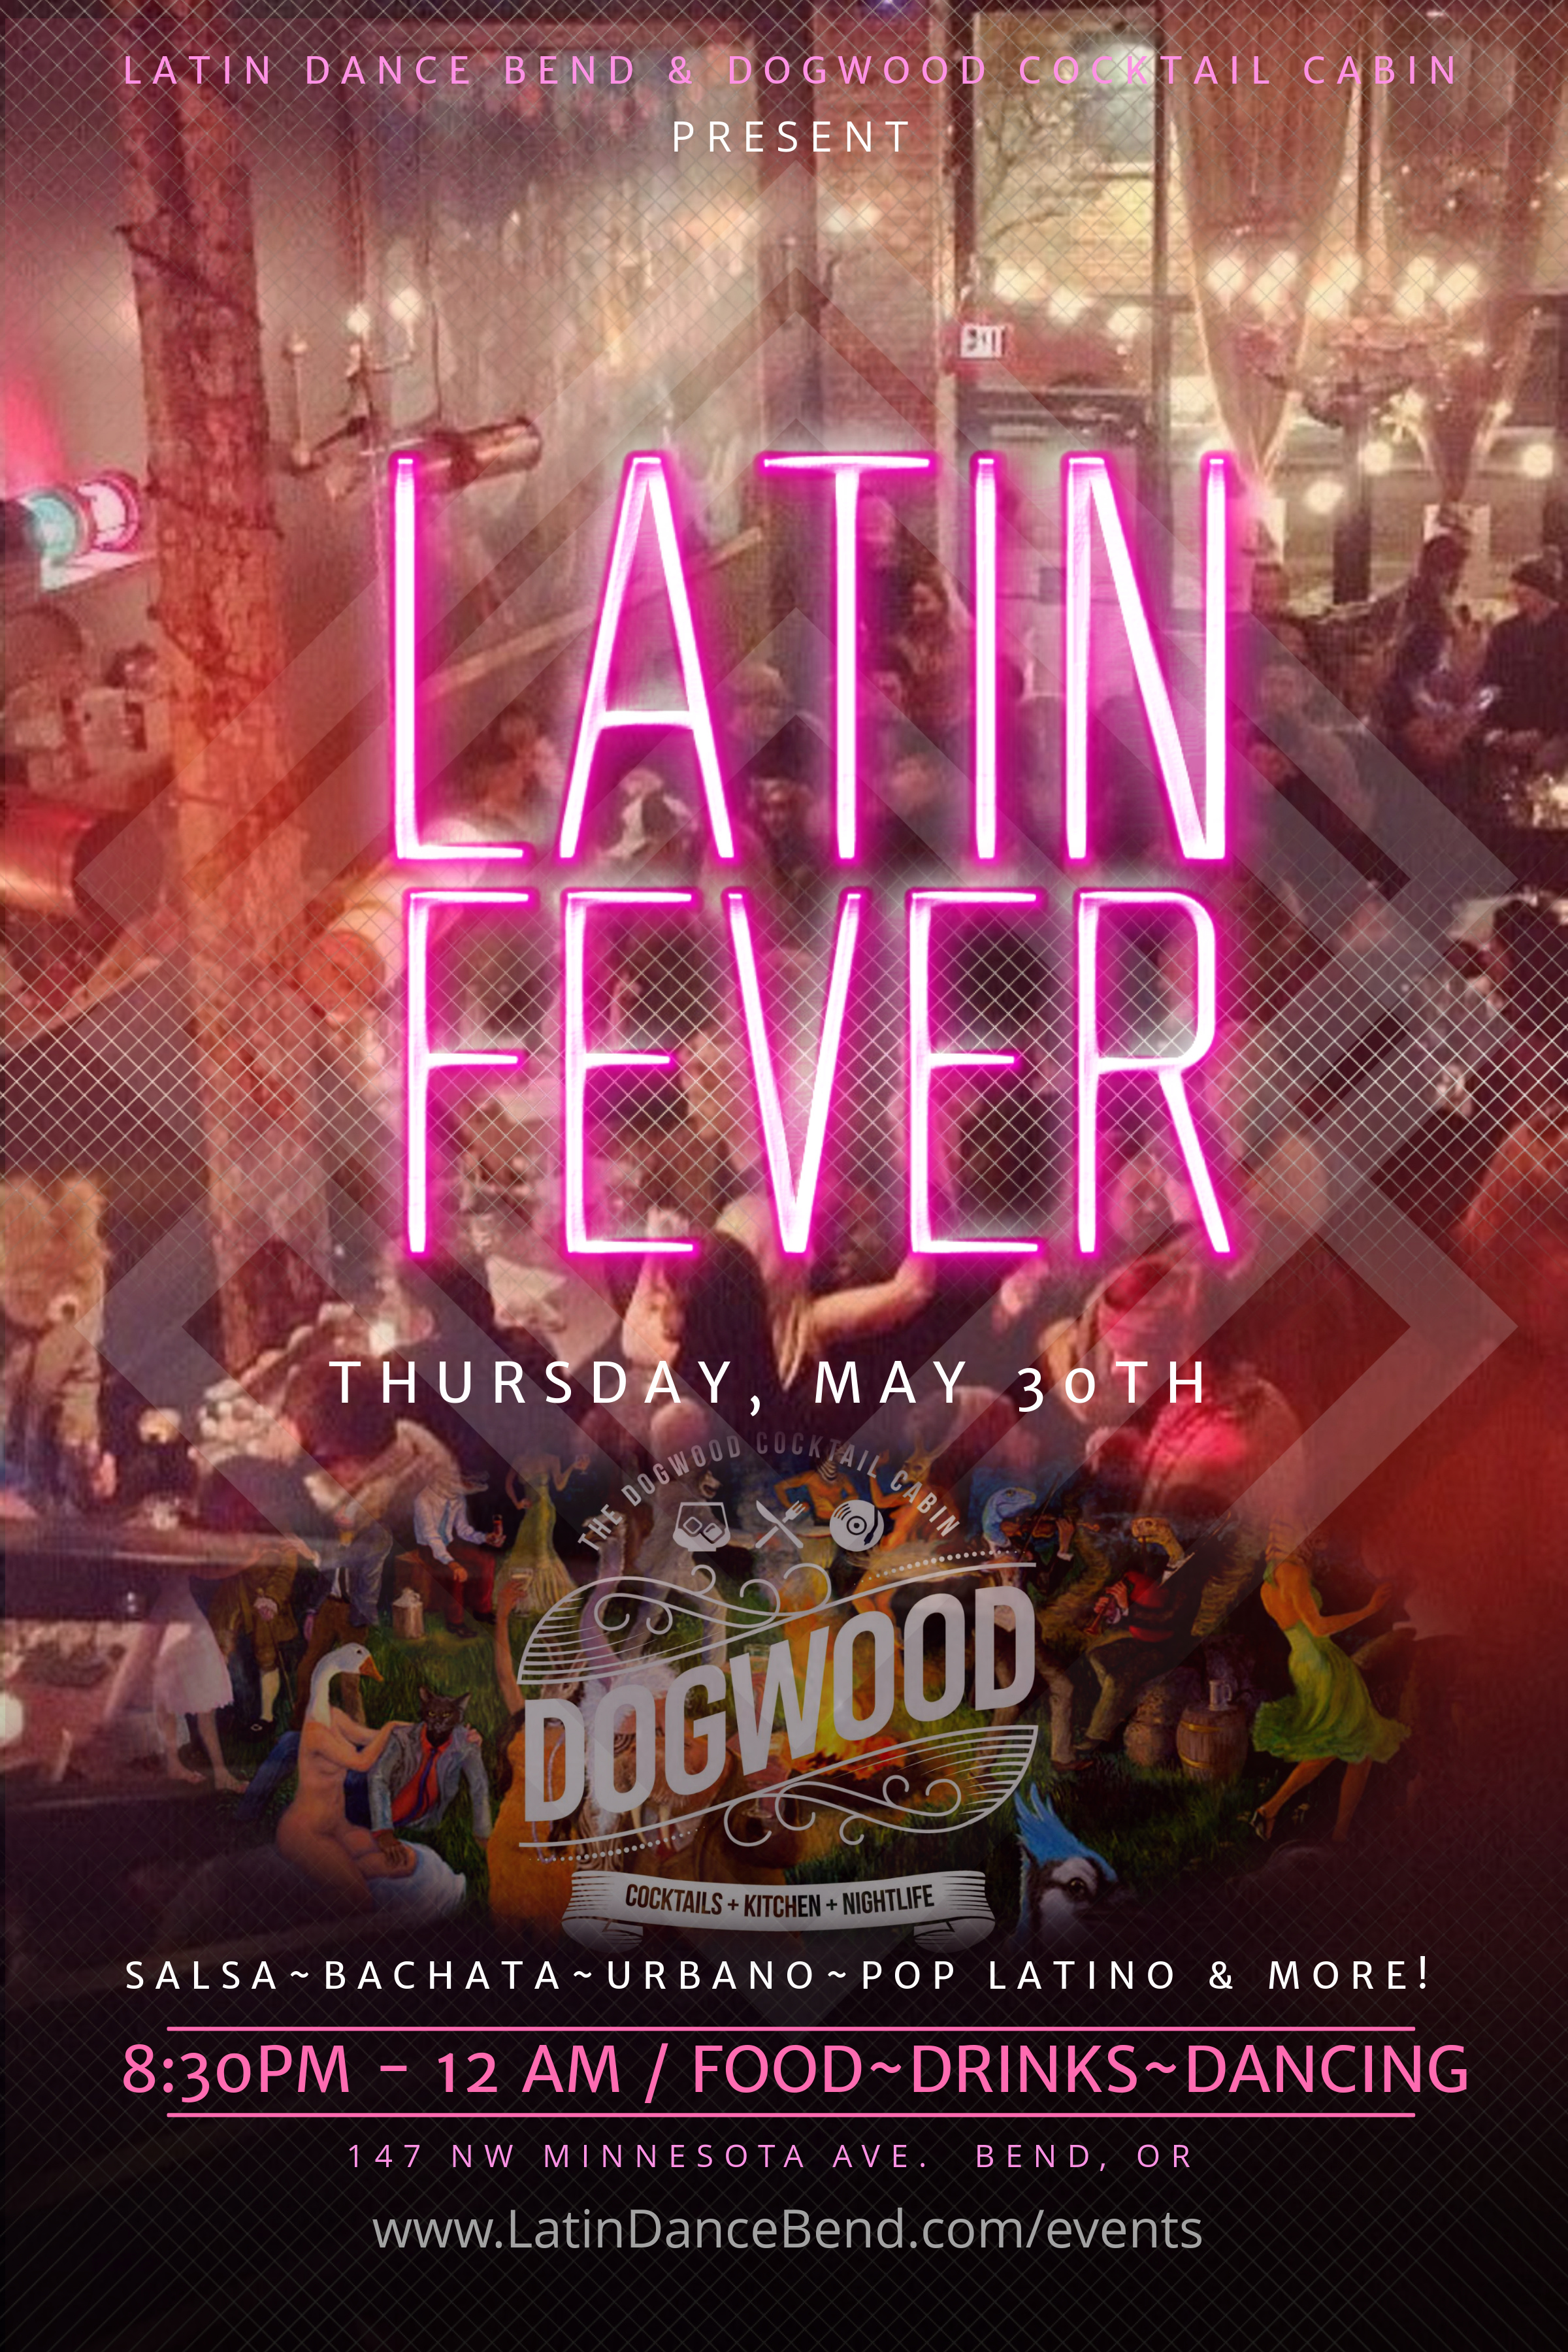 LatinFEVER-Dogwood-MAY30.jpg